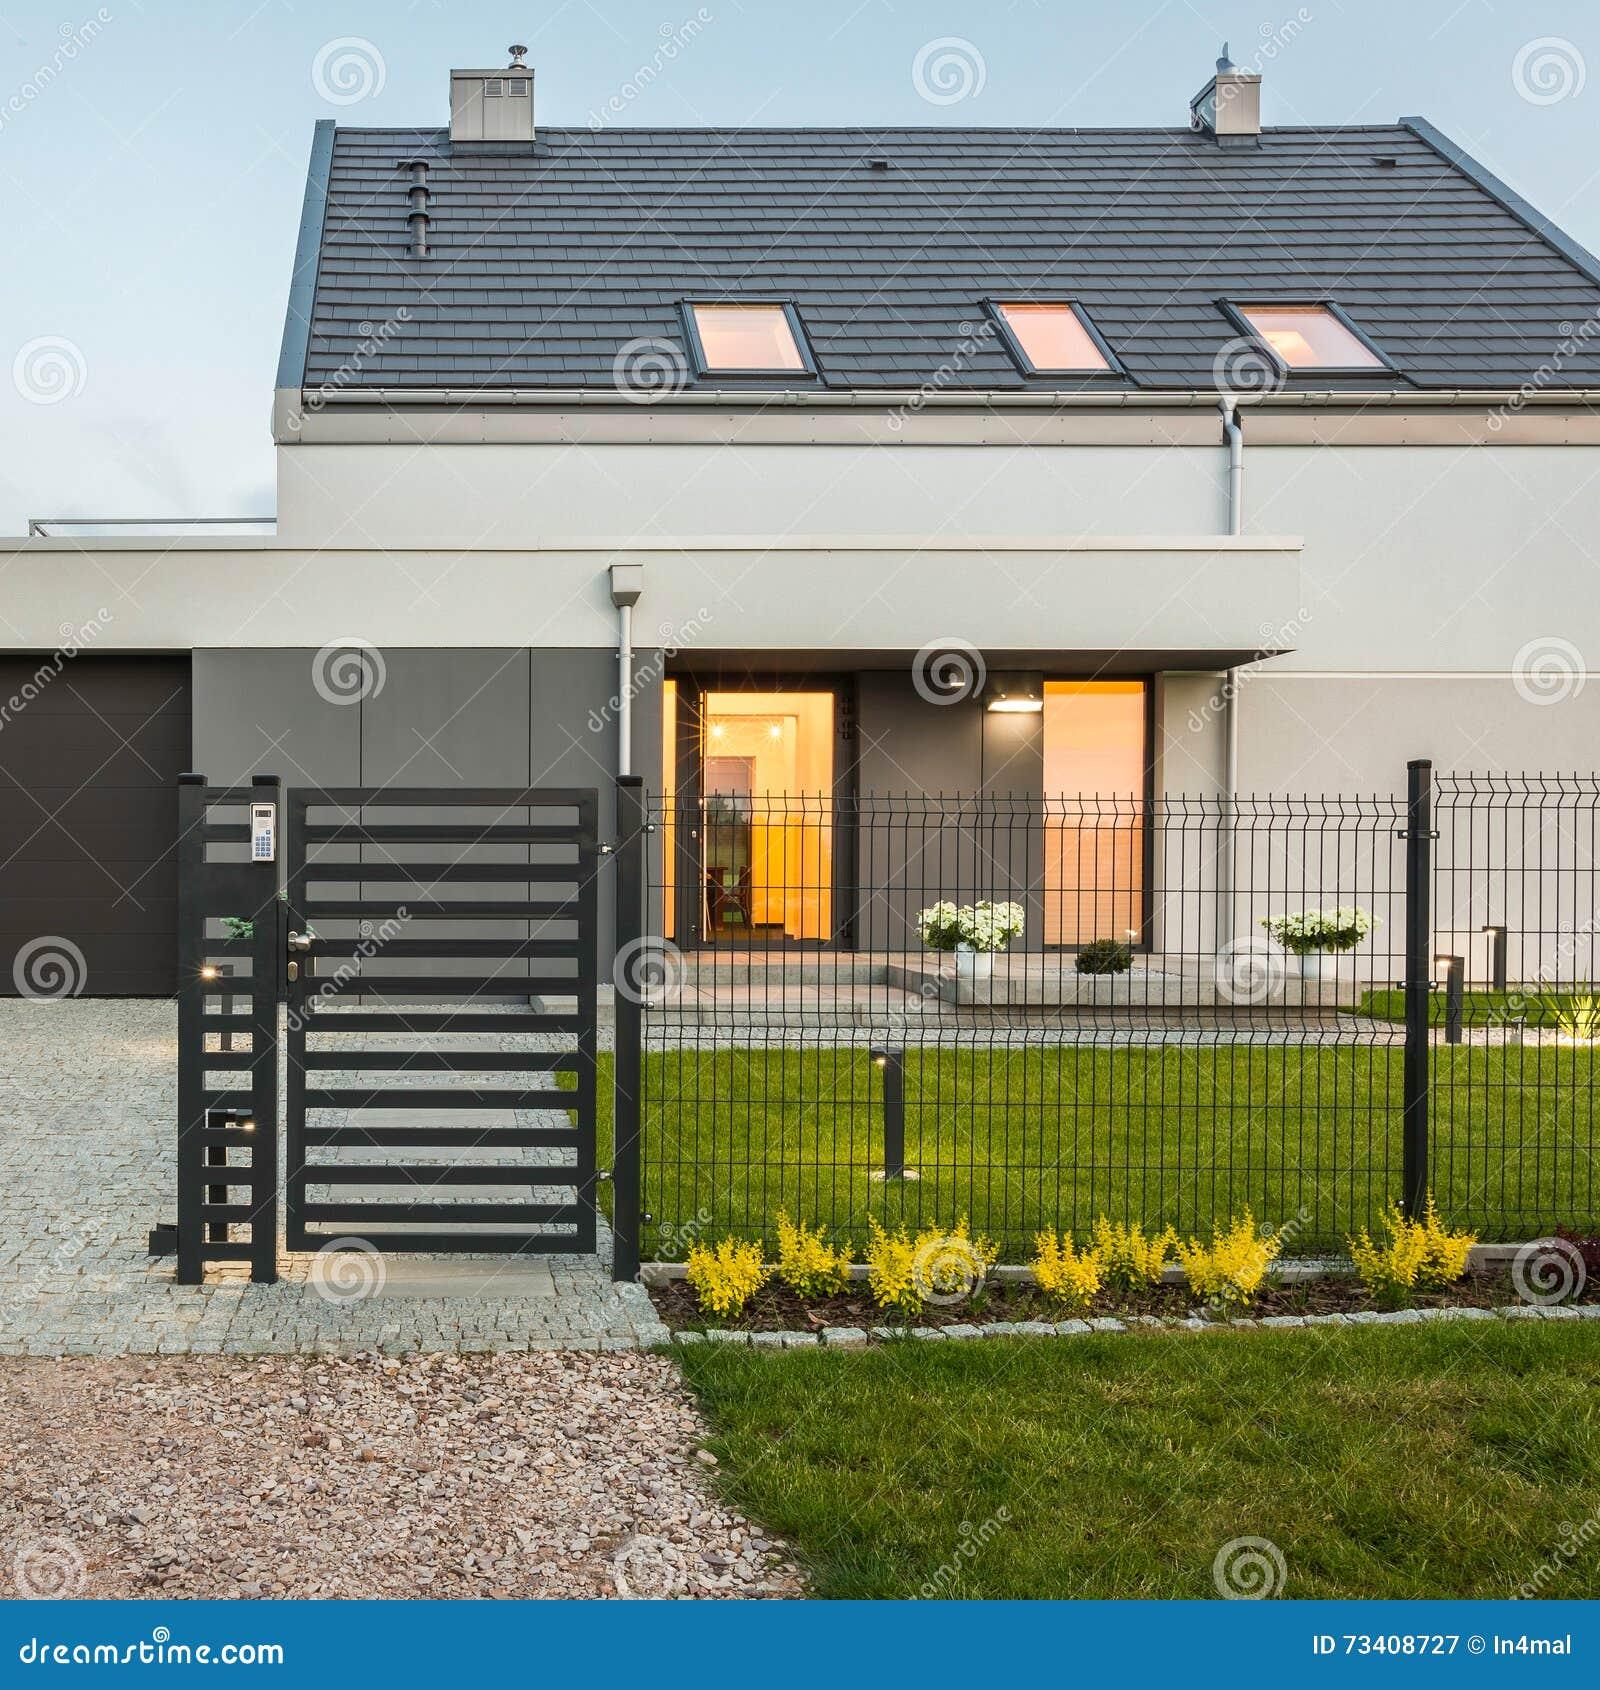 Home Modernt För Staket Arkivfoto - Bild: 73408727